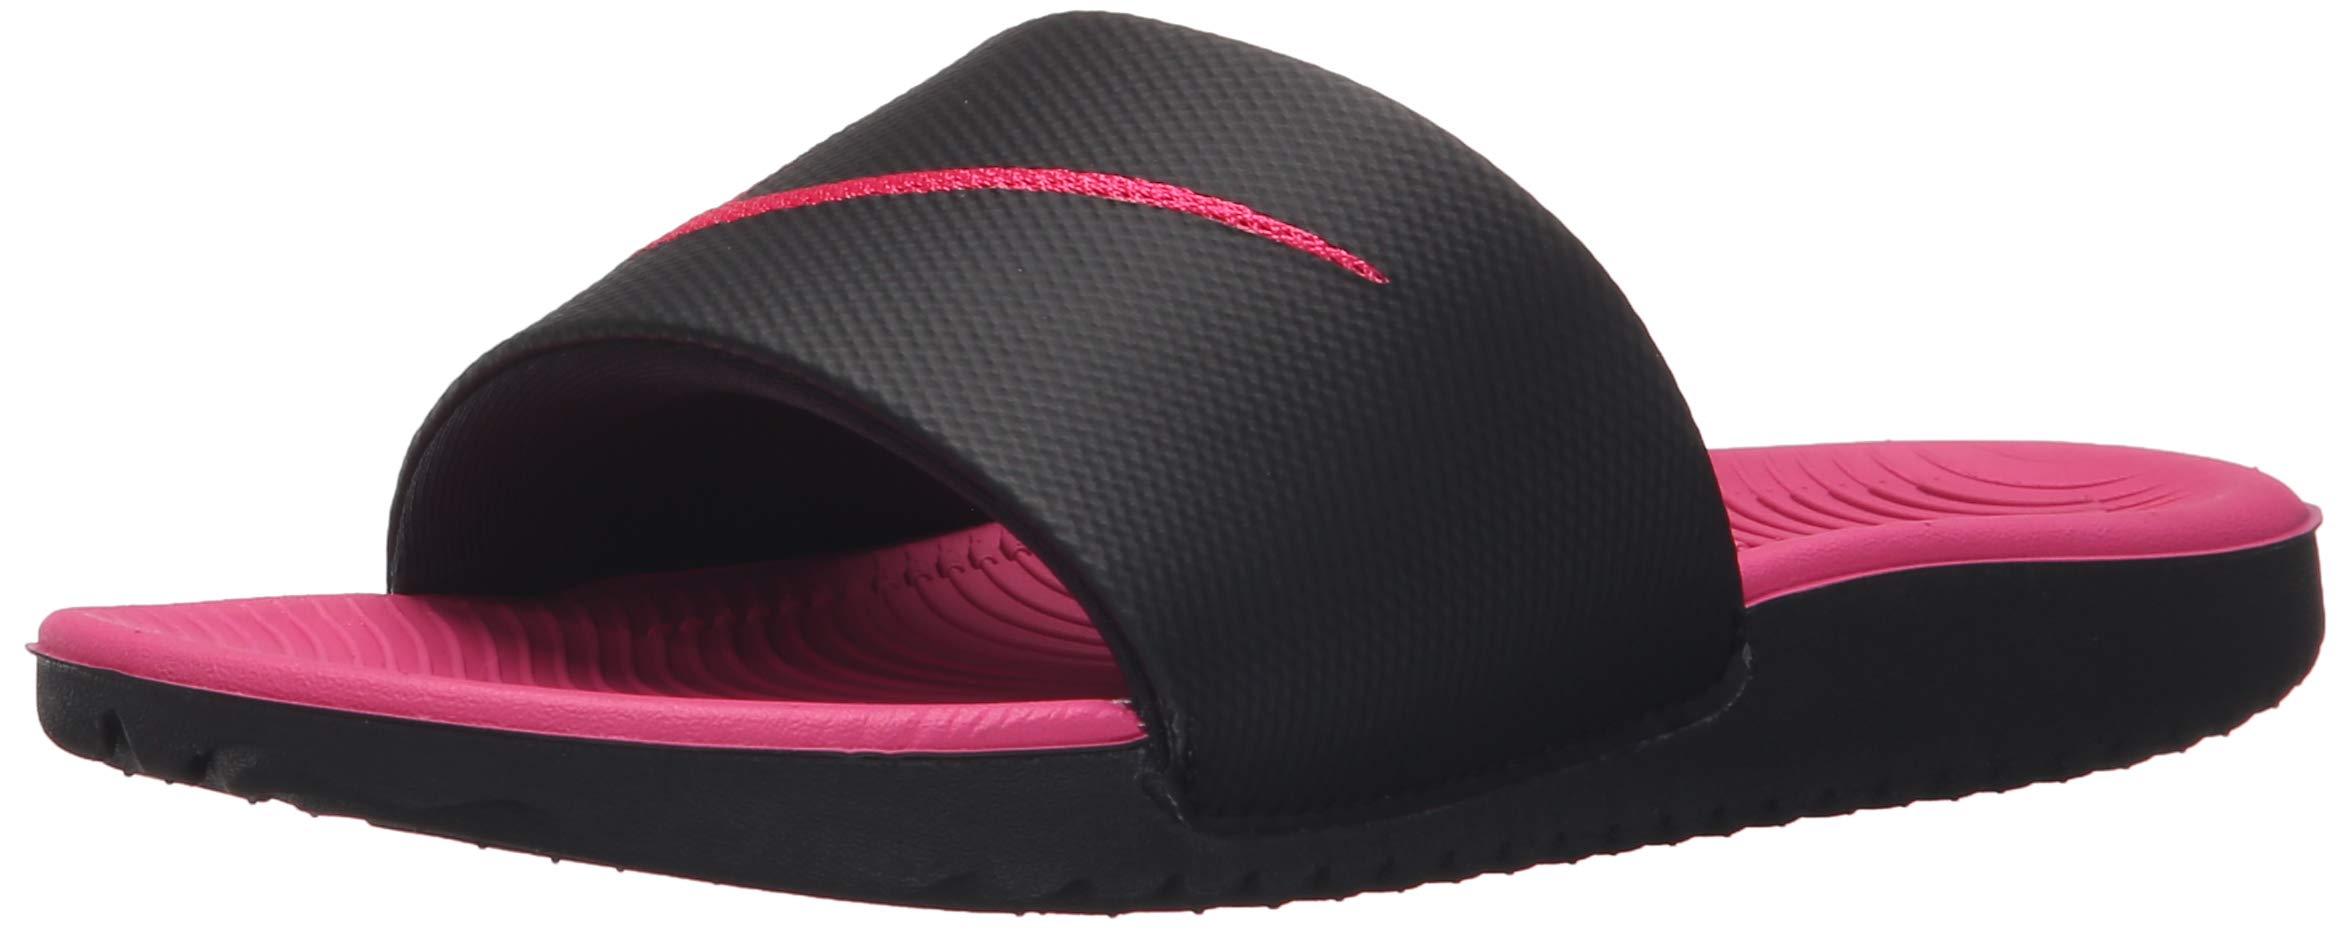 a4913c4c12111d Galleon - Nike Girls  Kawa Slide (GS PS) Running Shoe